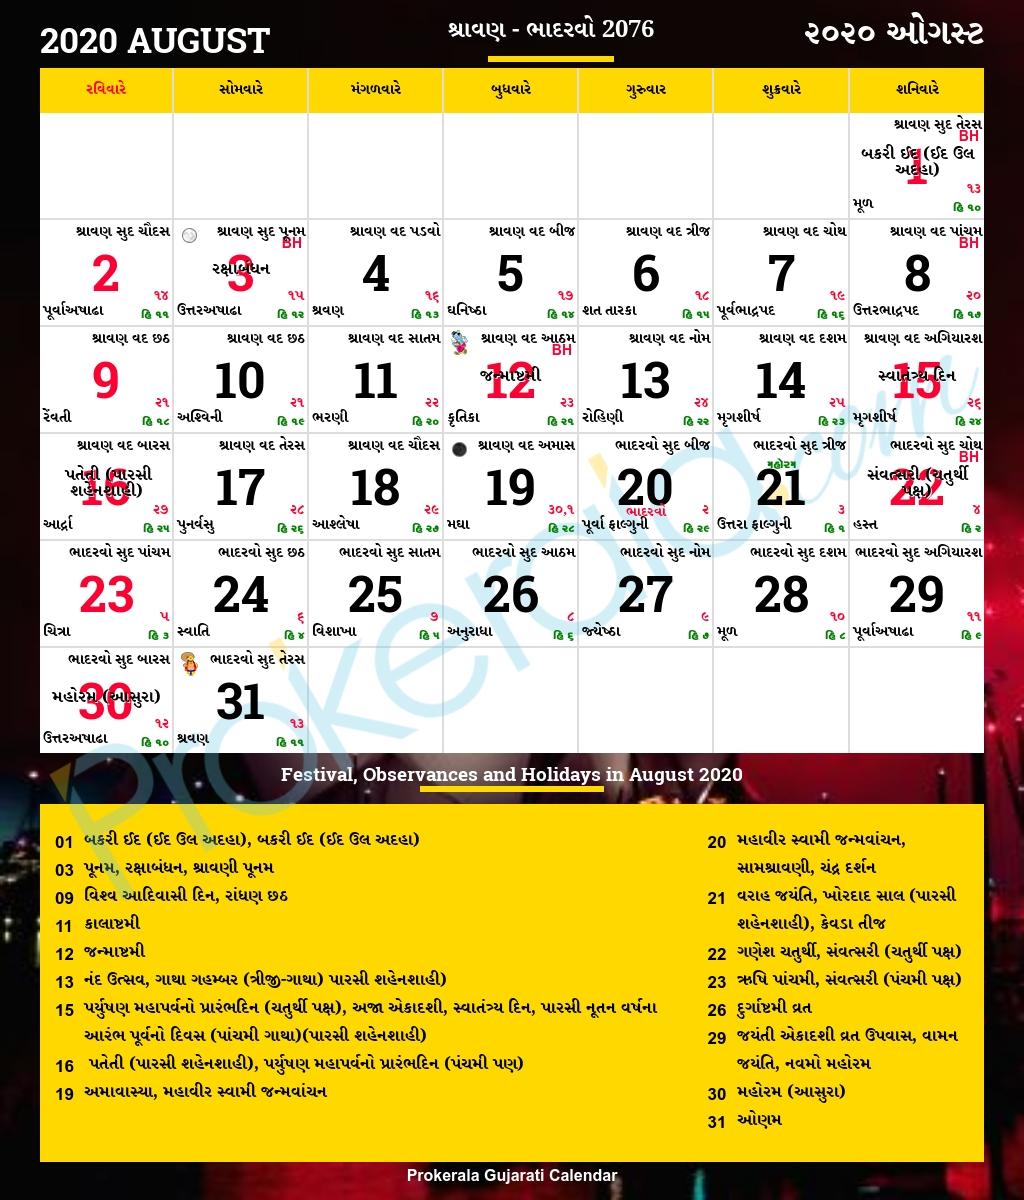 Gujarati Calendar | ગુજરાતી કૅલેન્ડર for 30 October 2002 Hindi Tithi